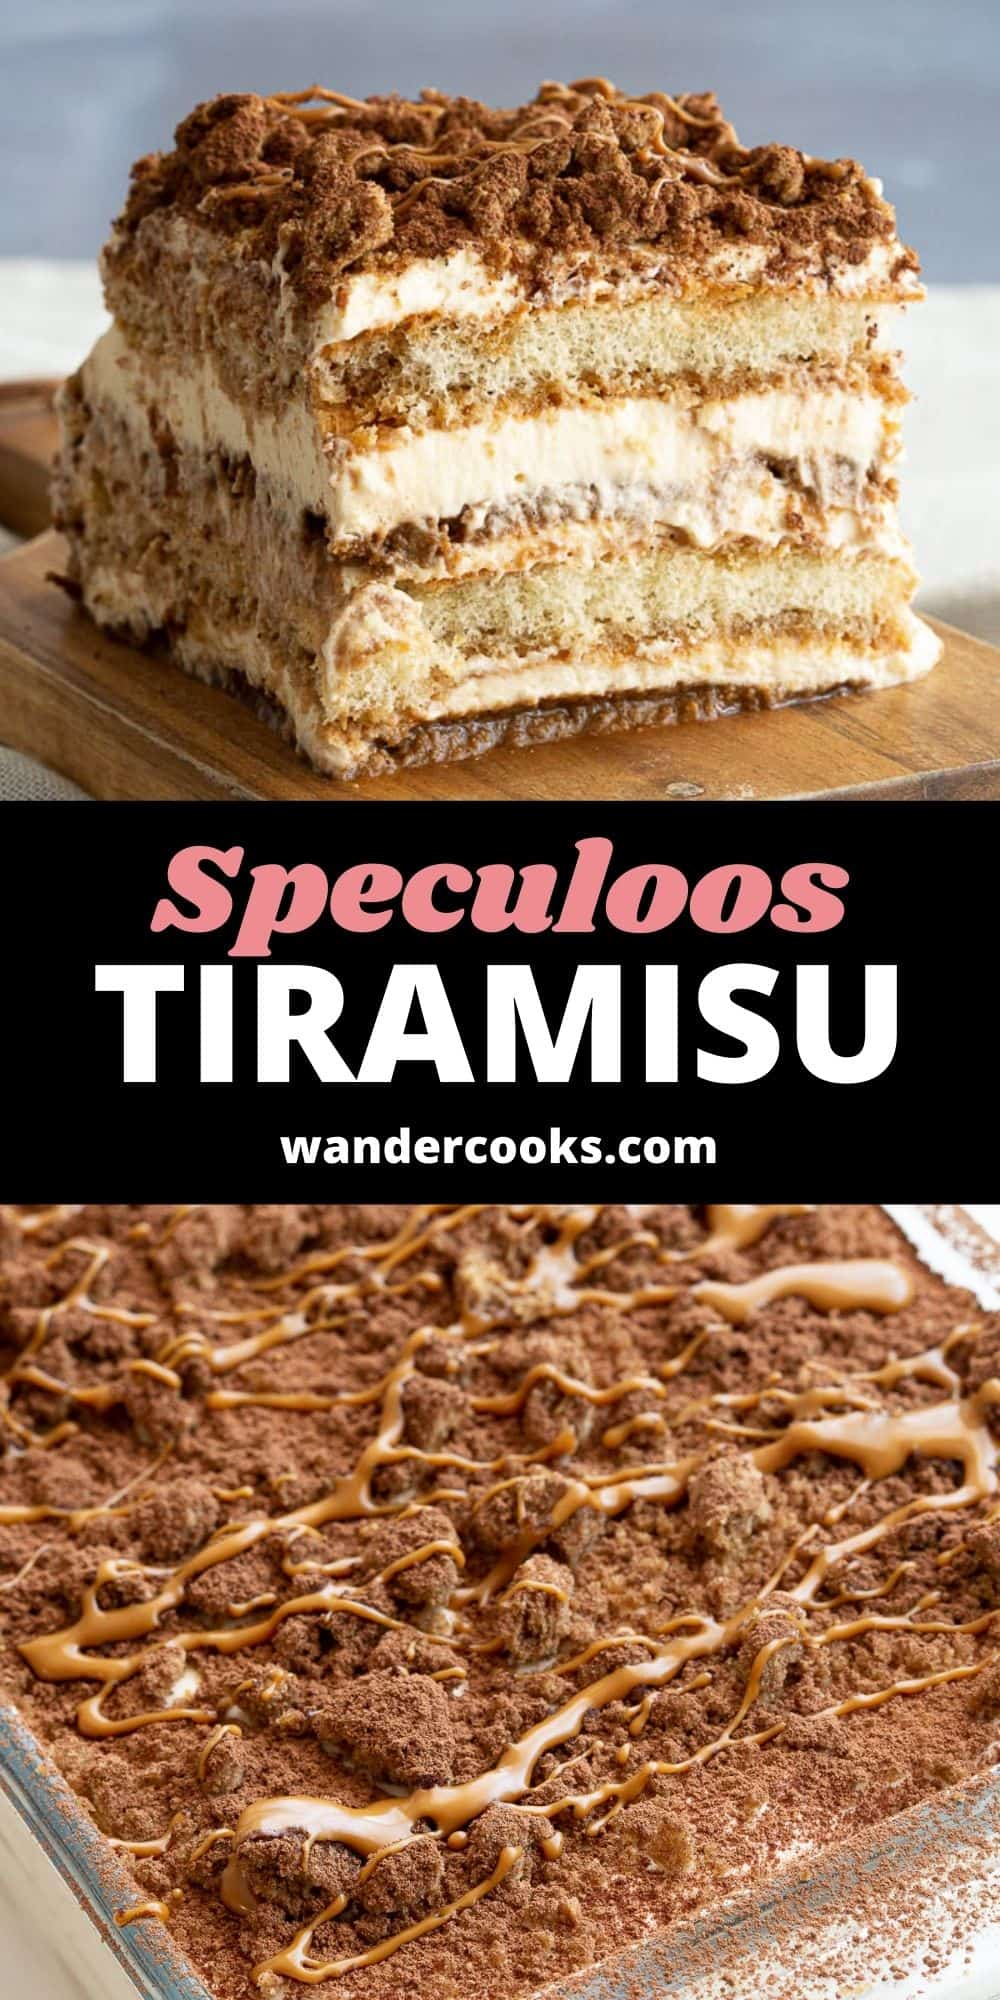 Easy Speculoos Tiramisu with Biscoff Spread